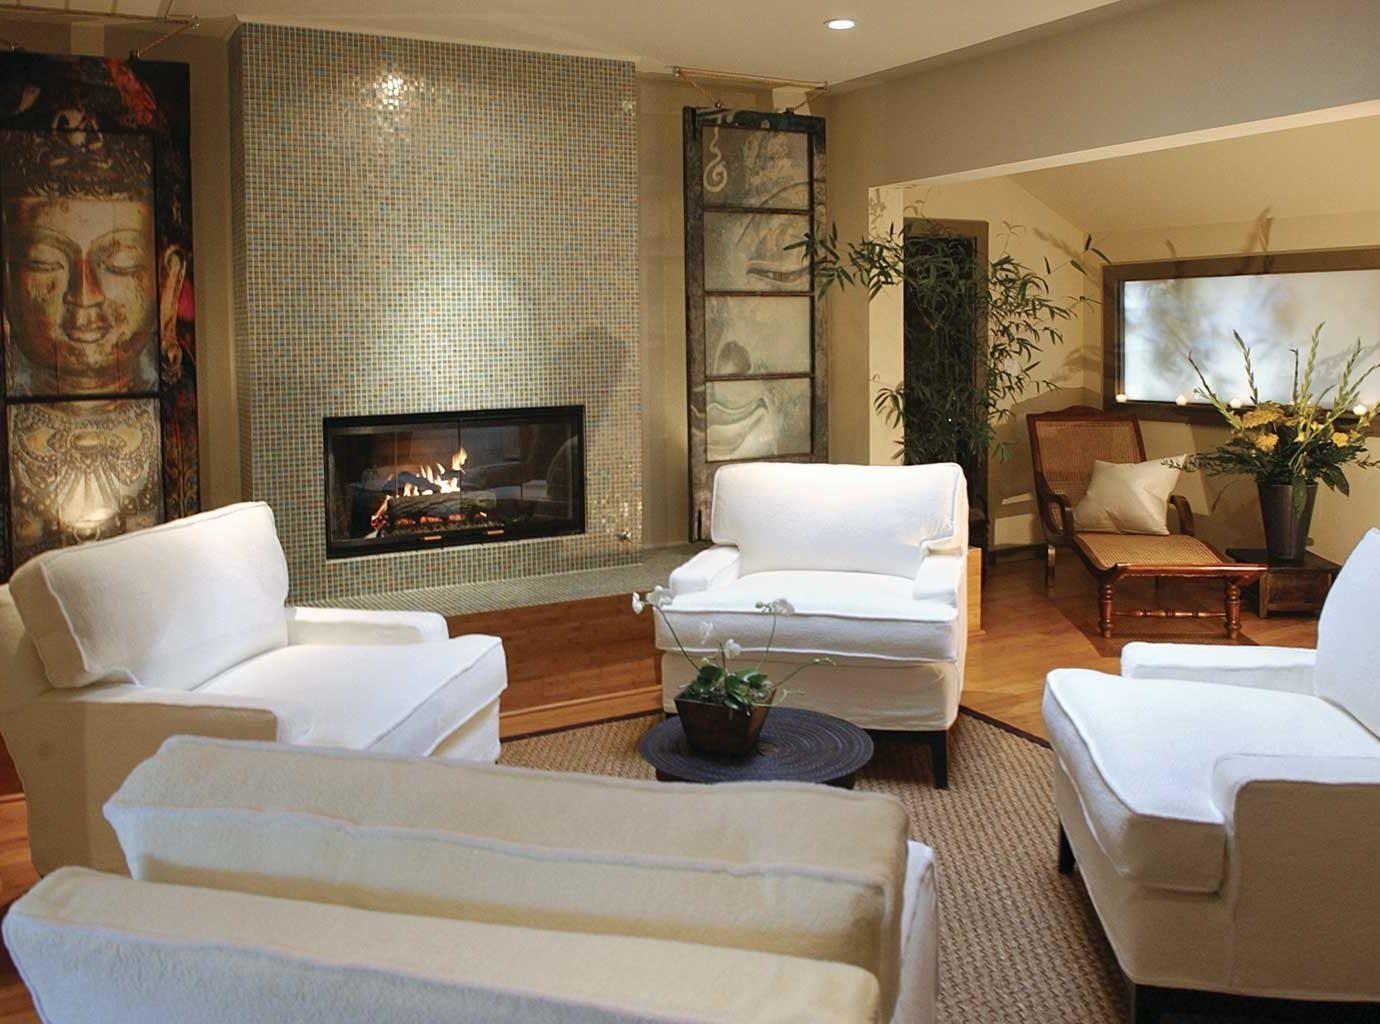 Fireplace Inn Romance Romantic property living room Suite condominium home cottage Villa